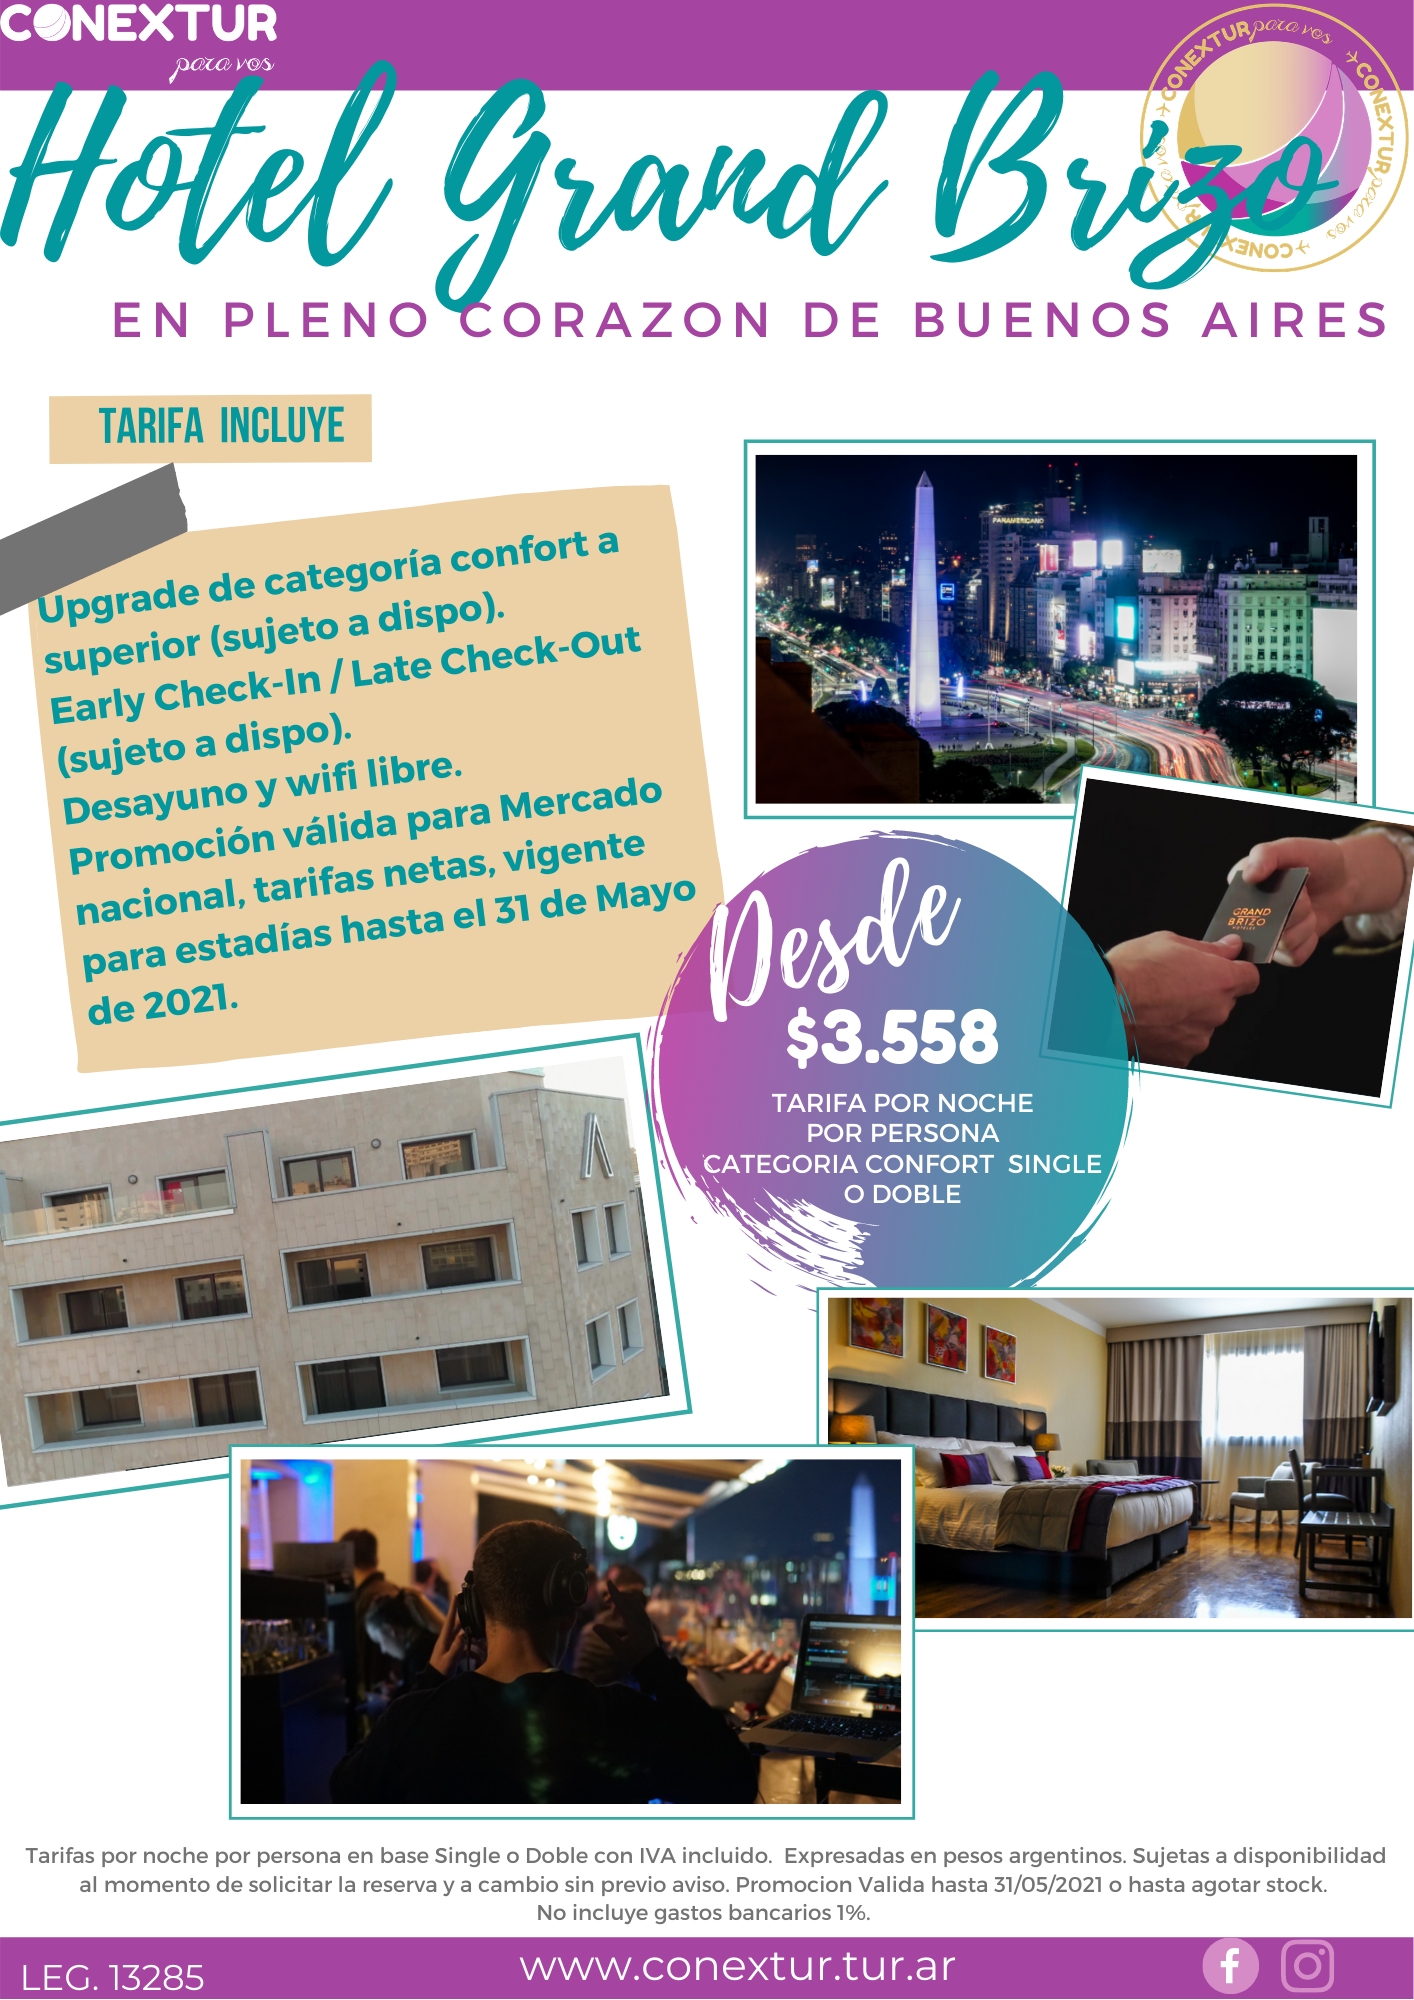 Hotel Grand Brizo - Buenos Aires